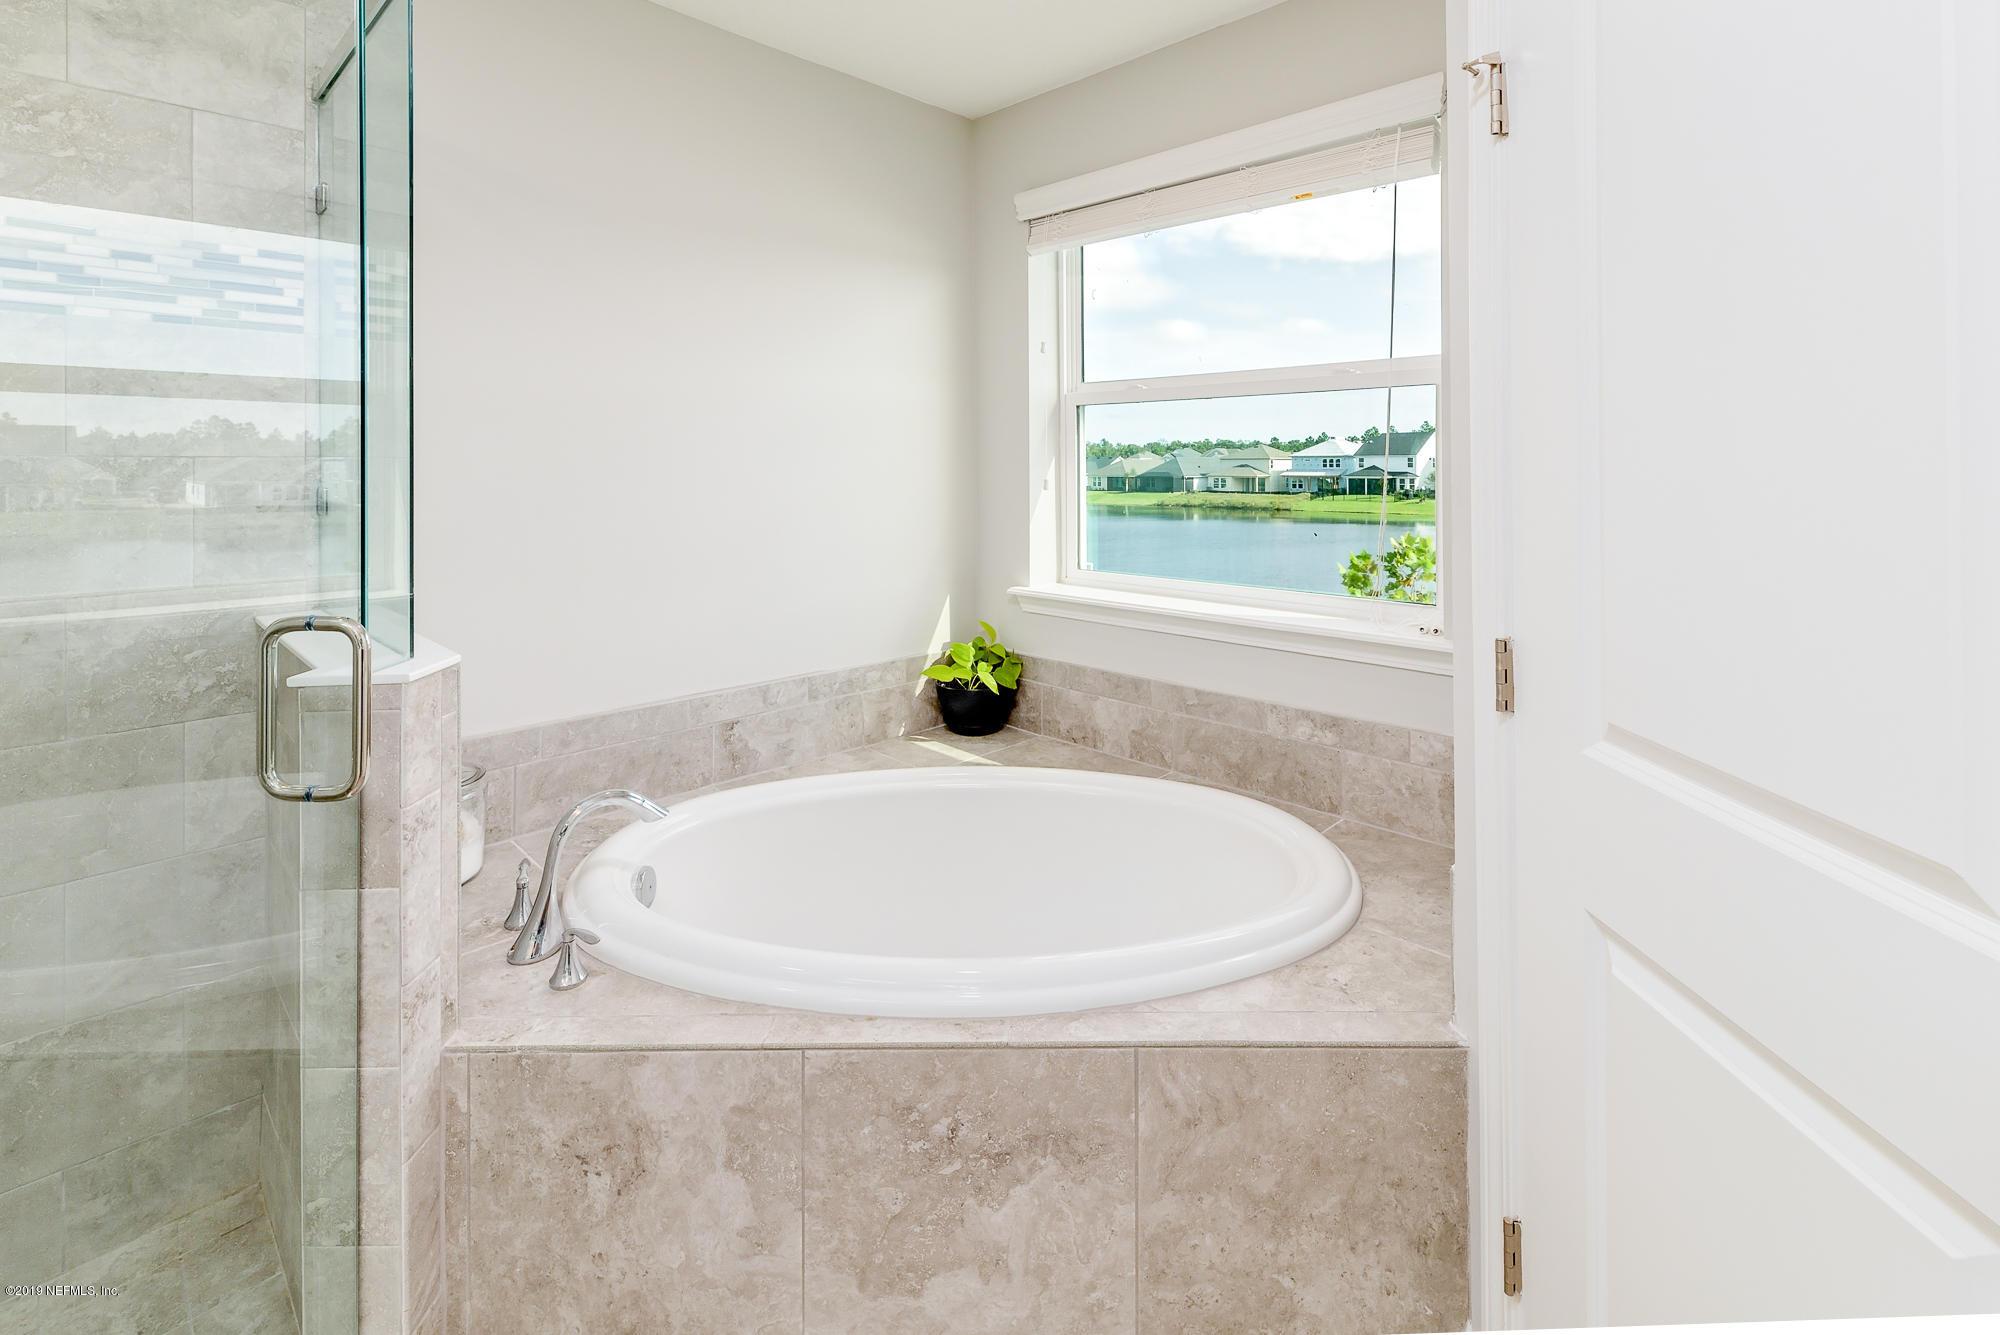 481 VISTA LAKE, PONTE VEDRA, FLORIDA 32081, 3 Bedrooms Bedrooms, ,2 BathroomsBathrooms,Residential - single family,For sale,VISTA LAKE,1022127